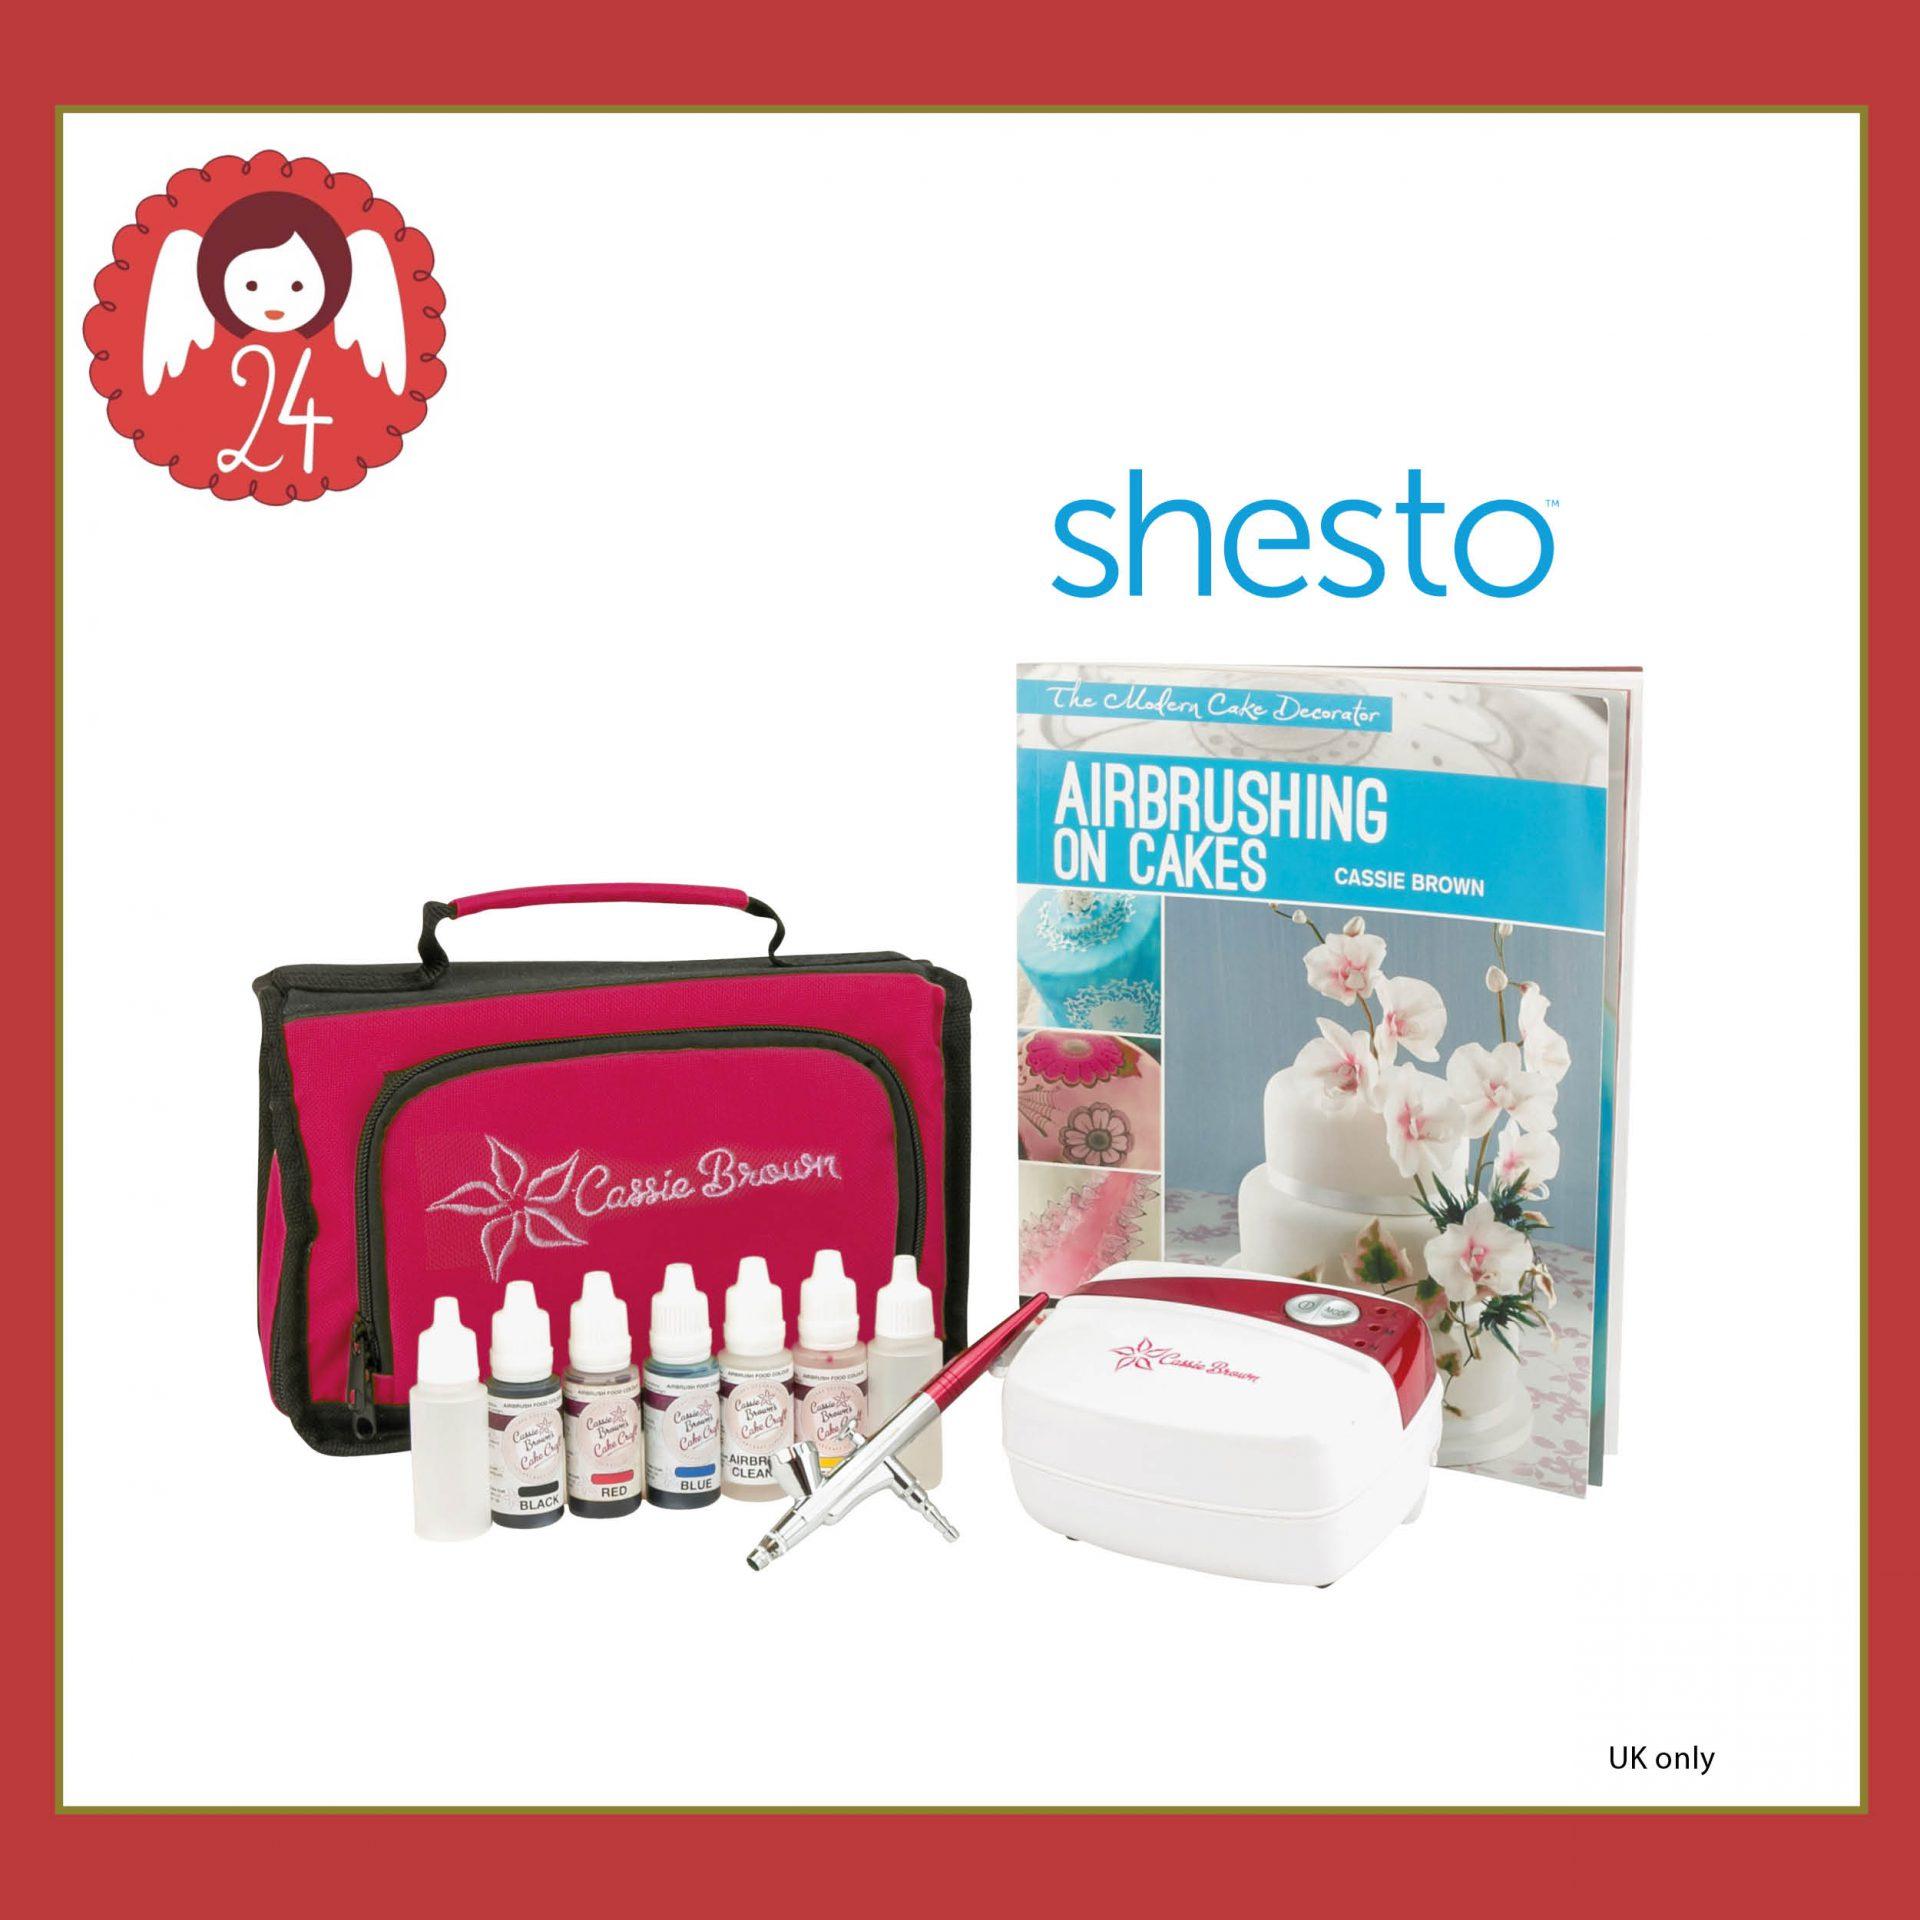 24th-december-shesto